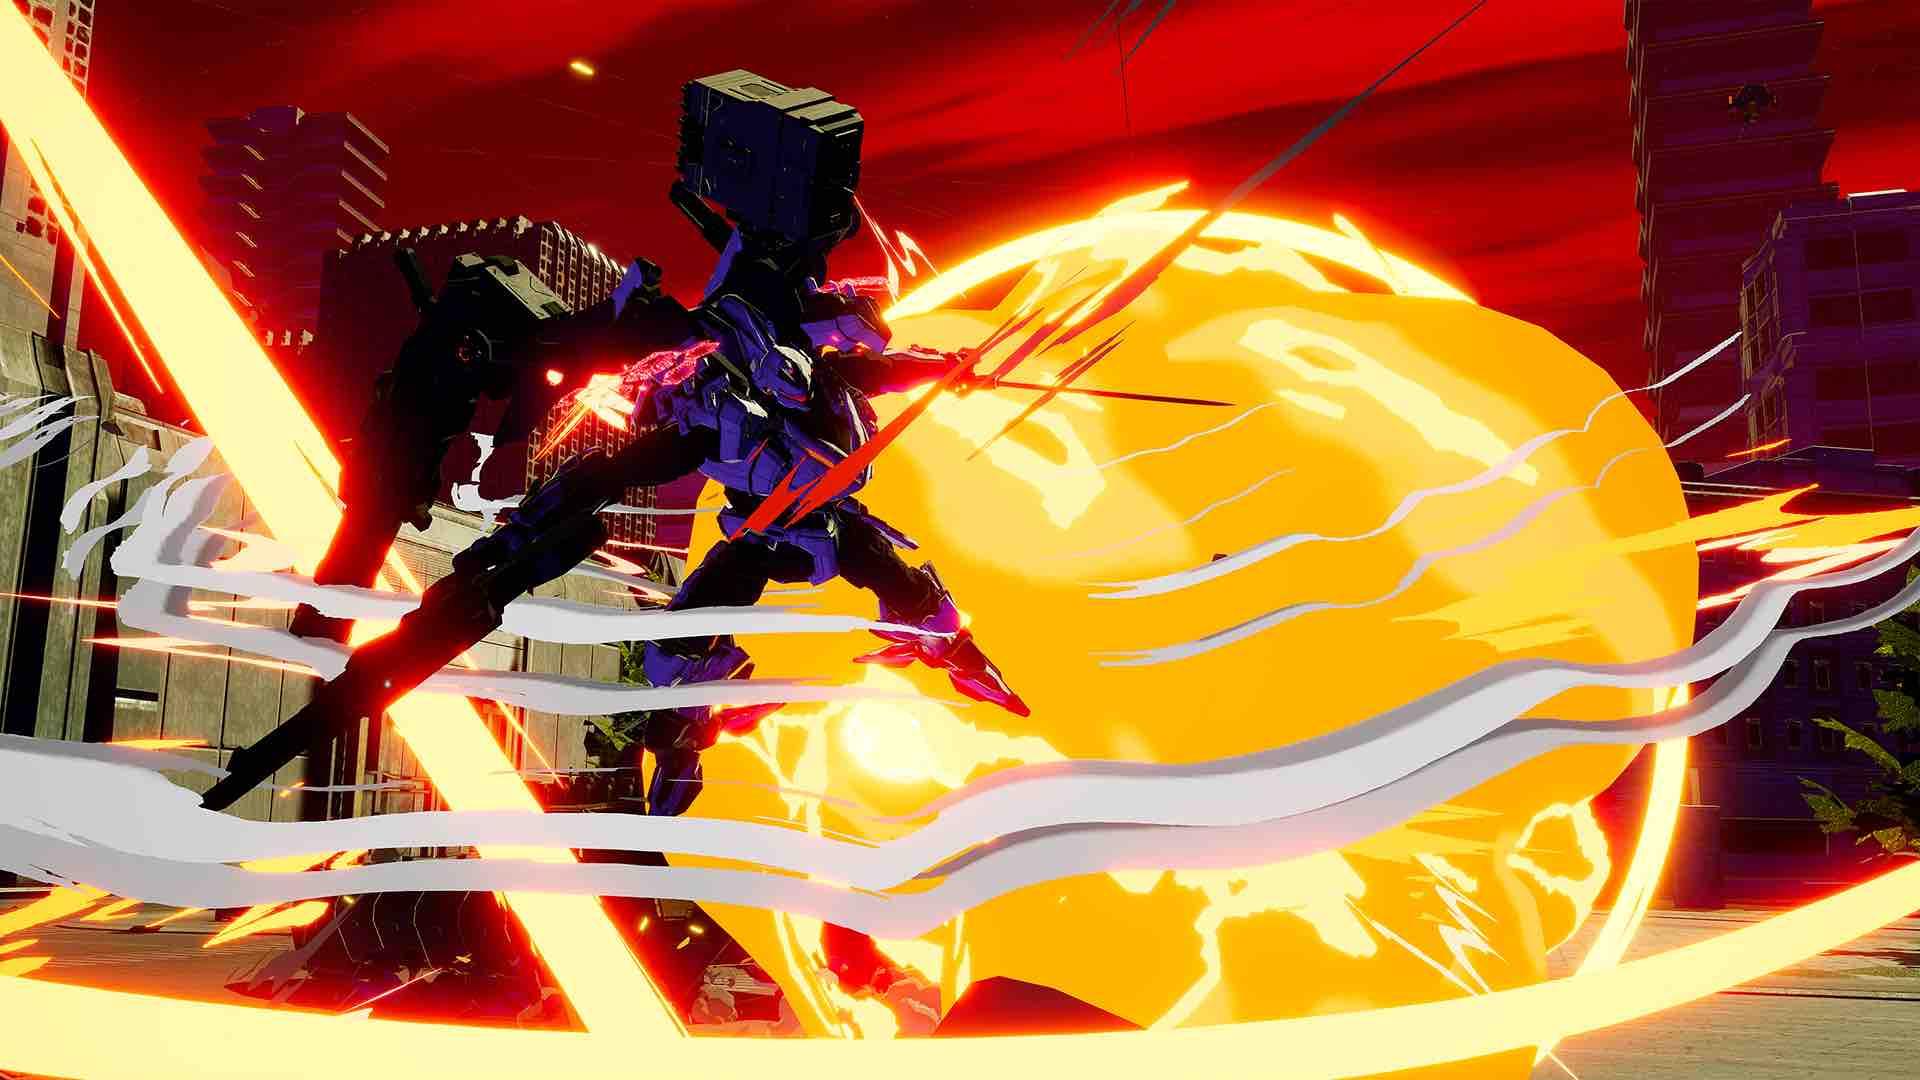 Daemon X Machina E3 2018 Screenshot 10